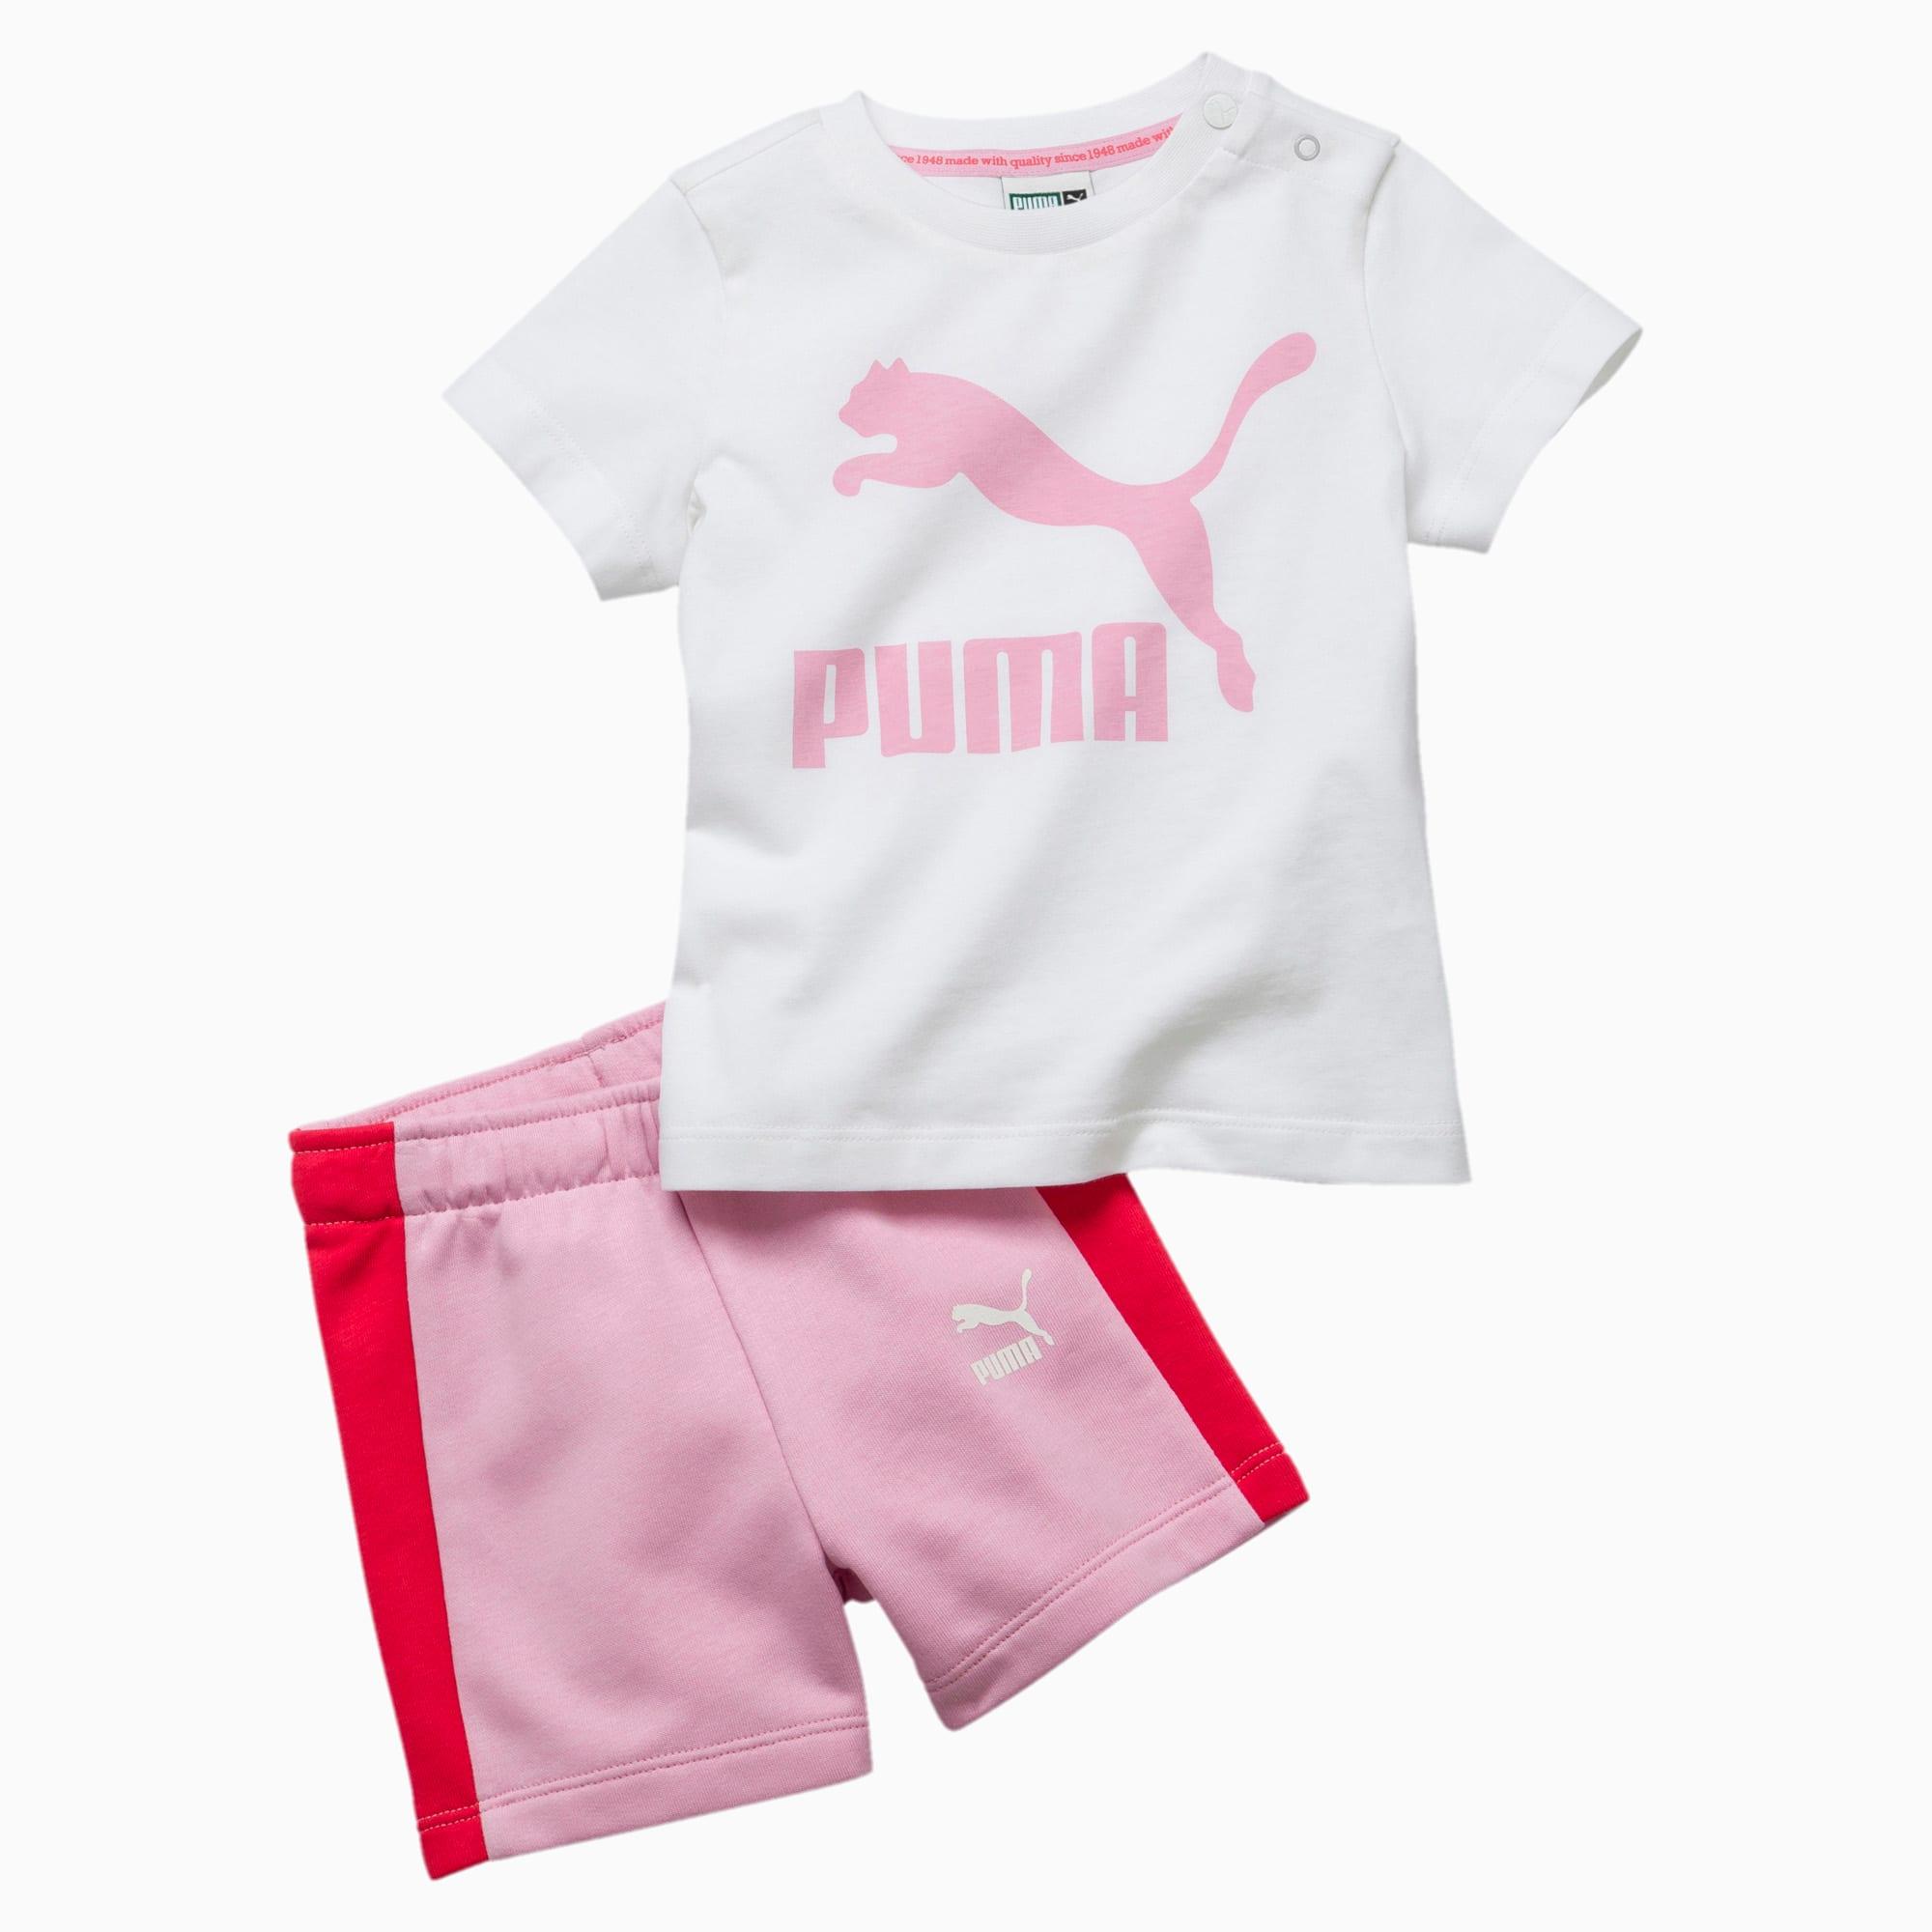 puma schuhe online kaufen, Kinder Accessoires Puma MINICATS